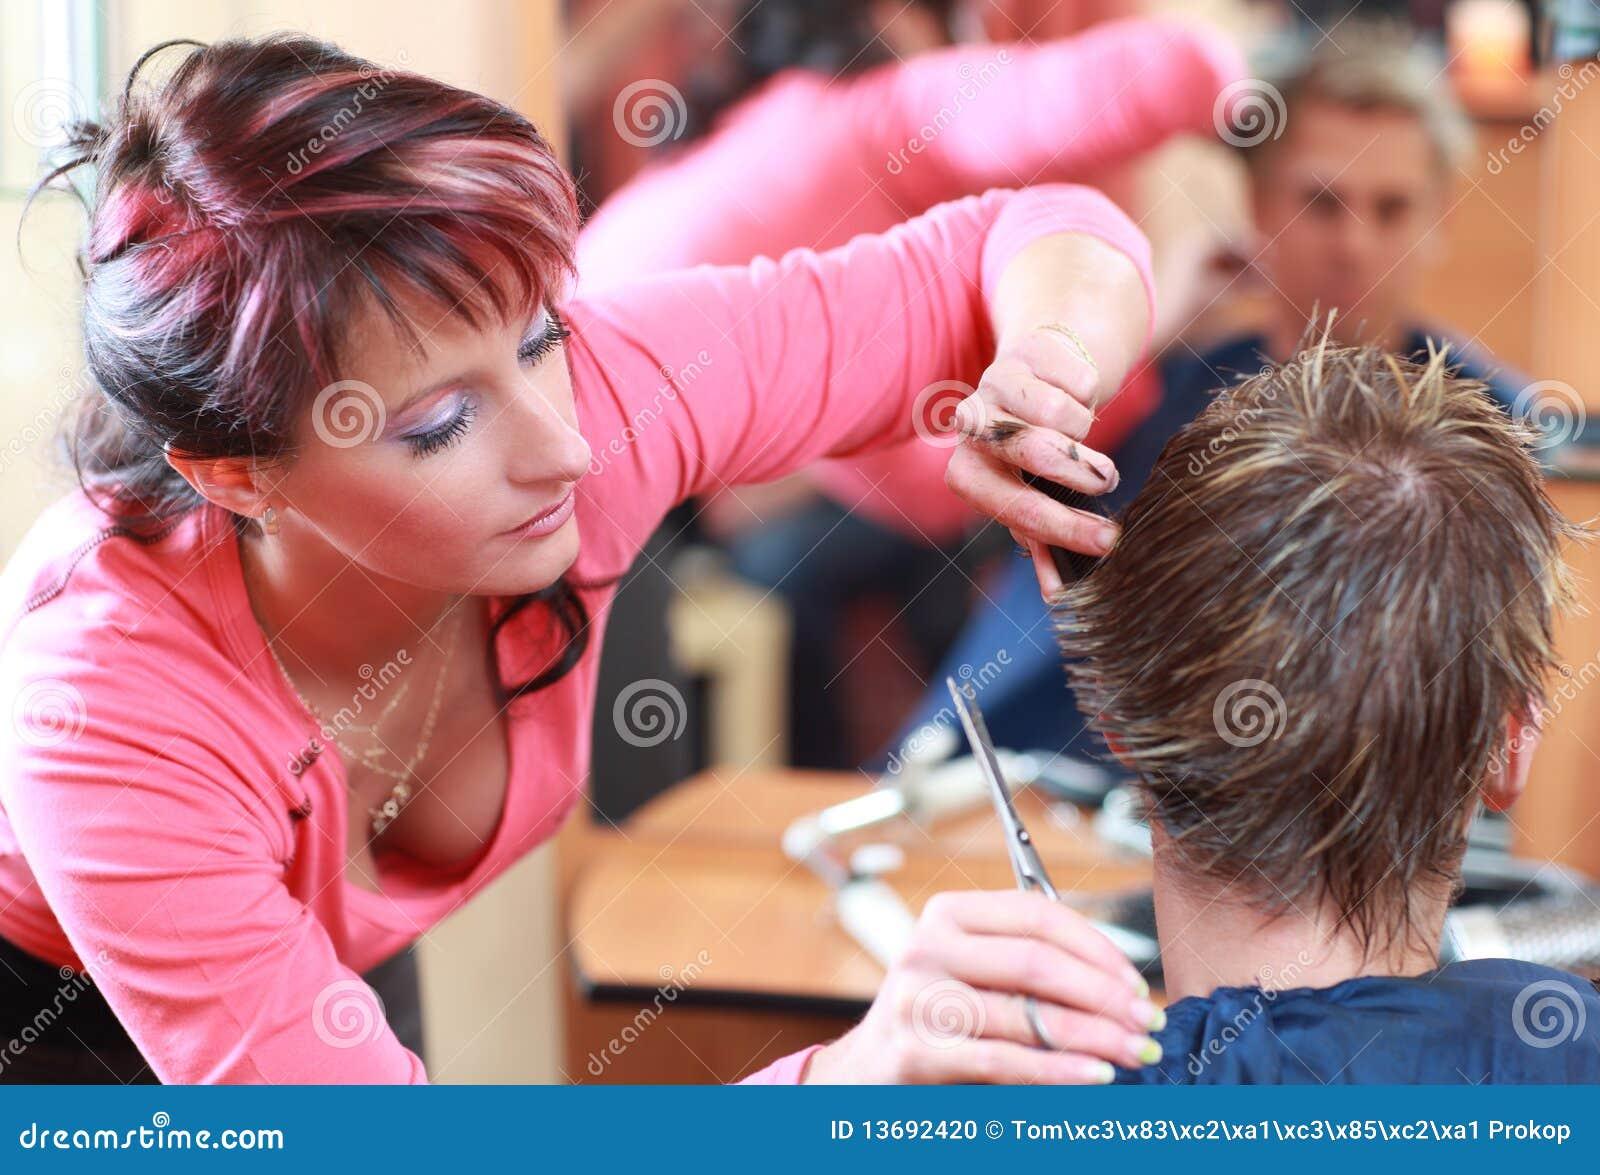 Hairdresser Cutting Hair Stock Photo Image Of Customer 13692420